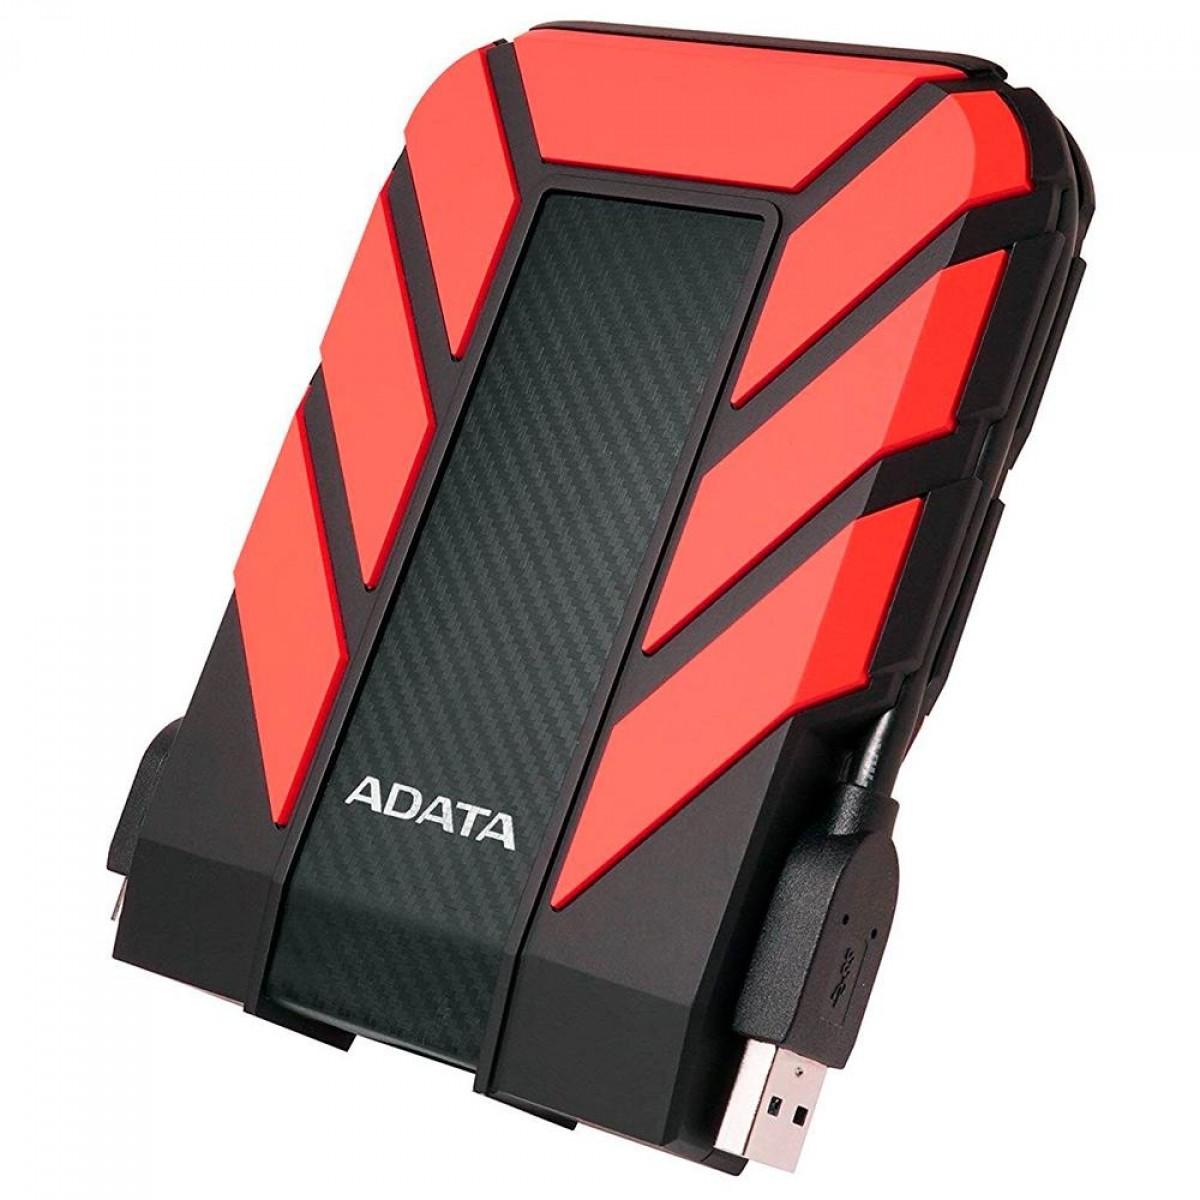 HD Externo Portátil Adata HD710 Pro 2TB, USB 3.2, Red, AHD710P-2TU31-CRD